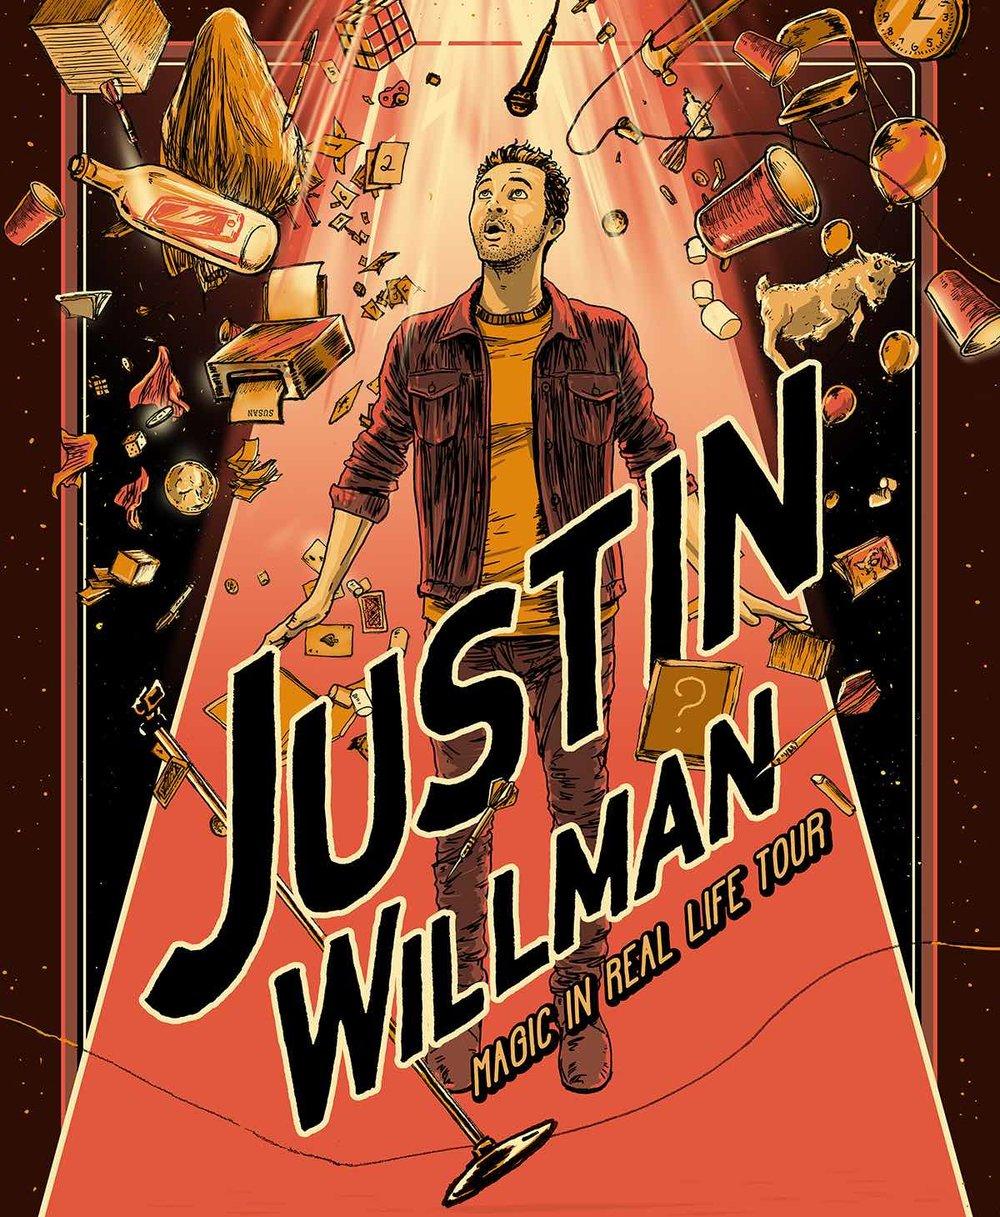 Justin_willman_lowresweb.jpg